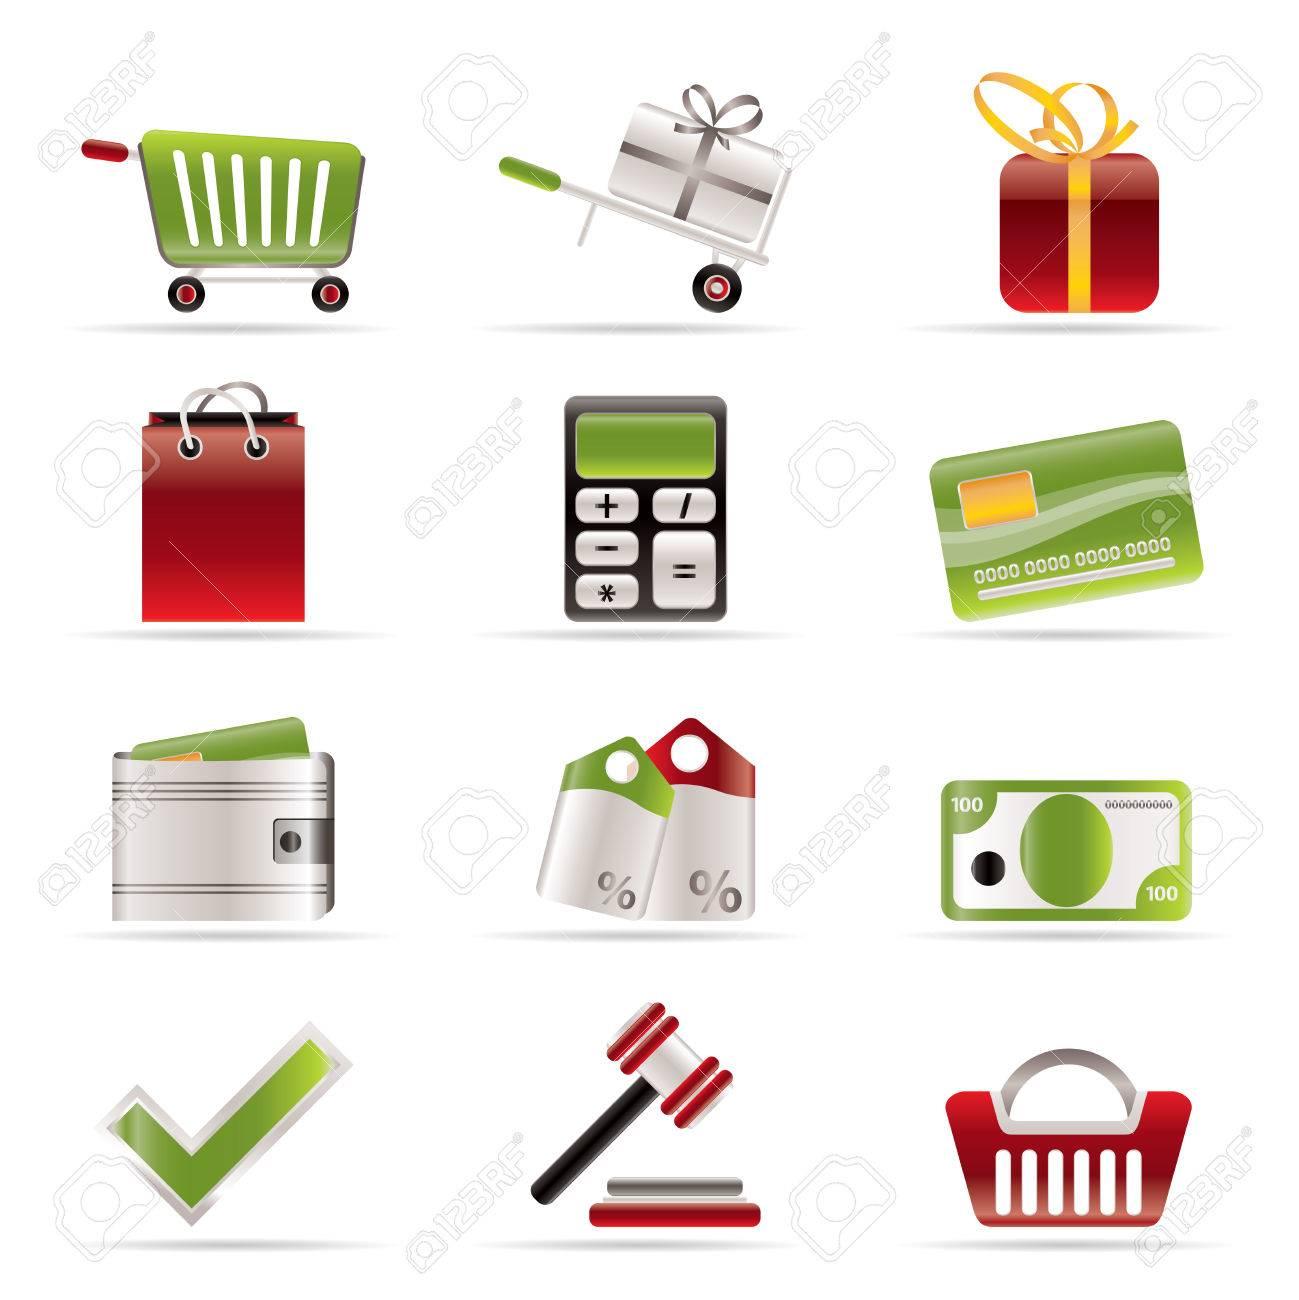 Online shop icons - vector  icon set Stock Vector - 5915410